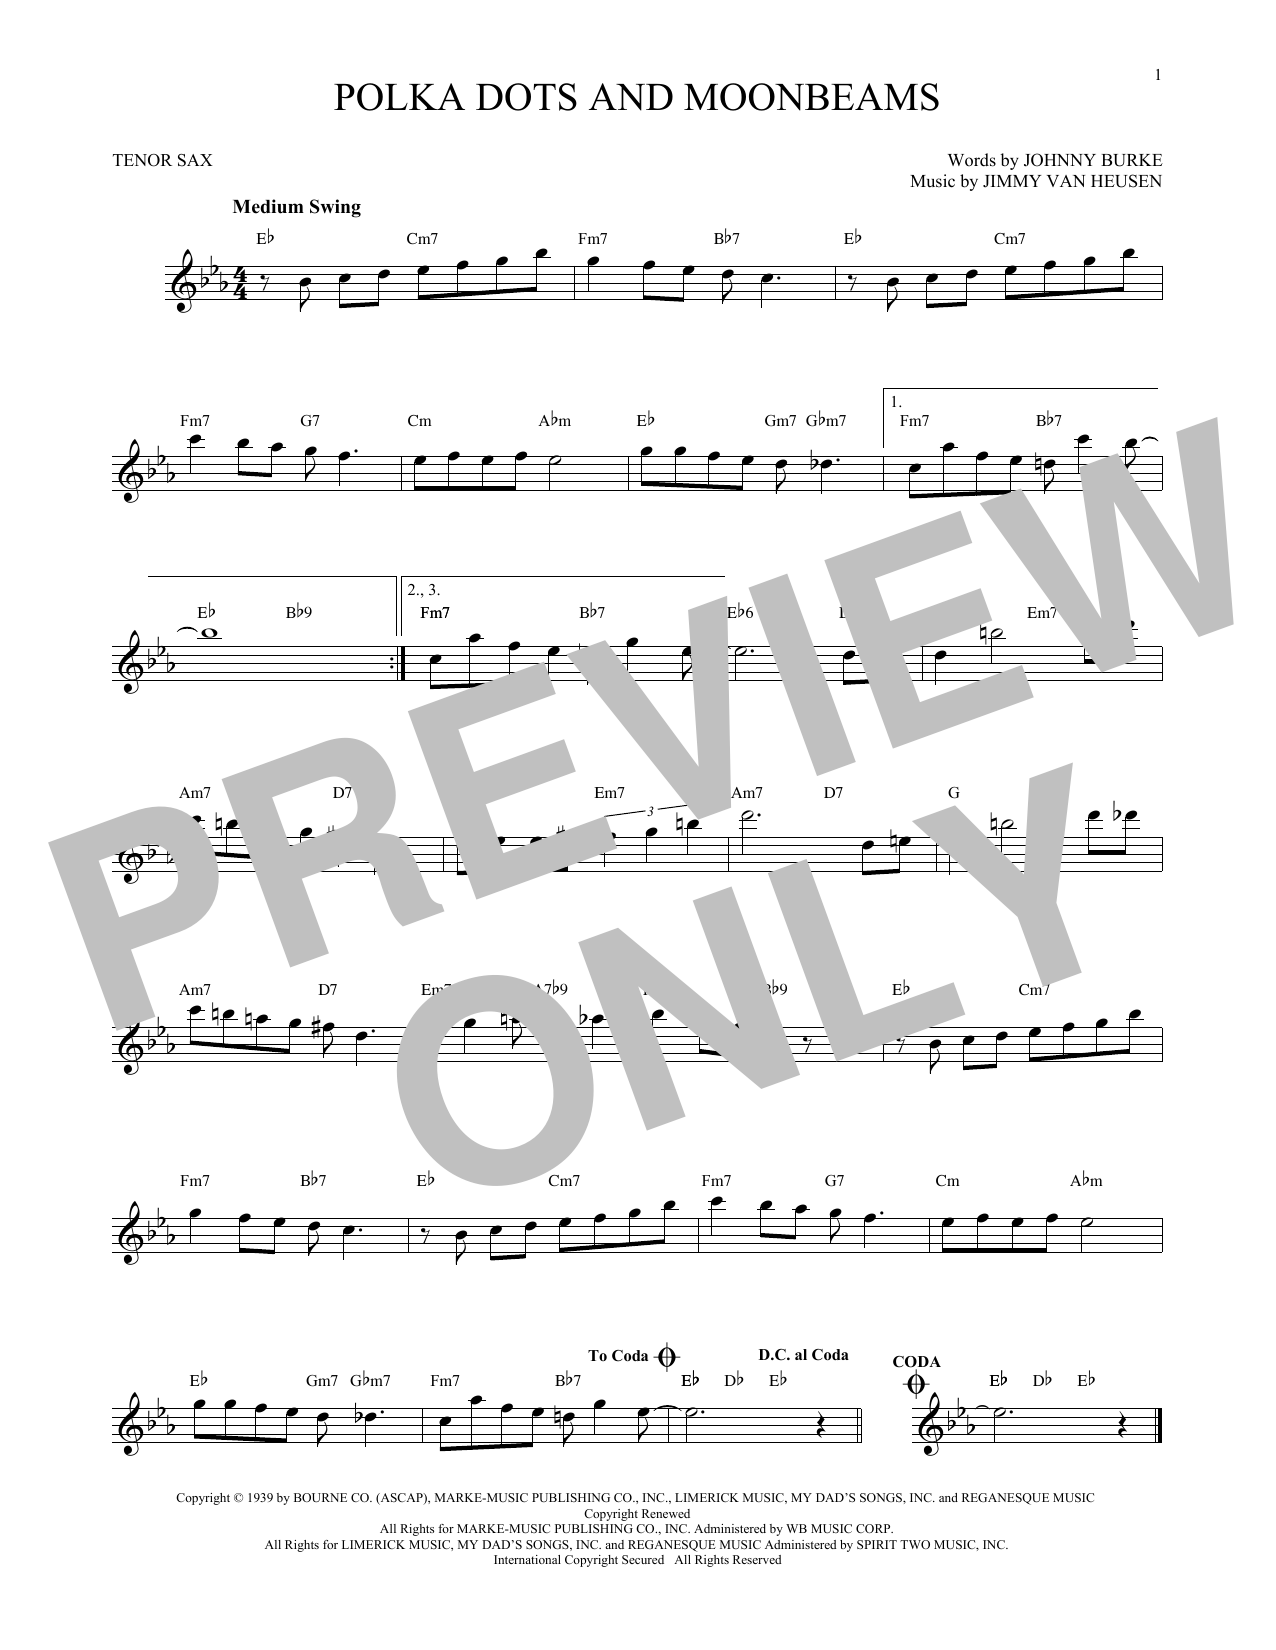 Polka Dots And Moonbeams (Tenor Sax Solo)